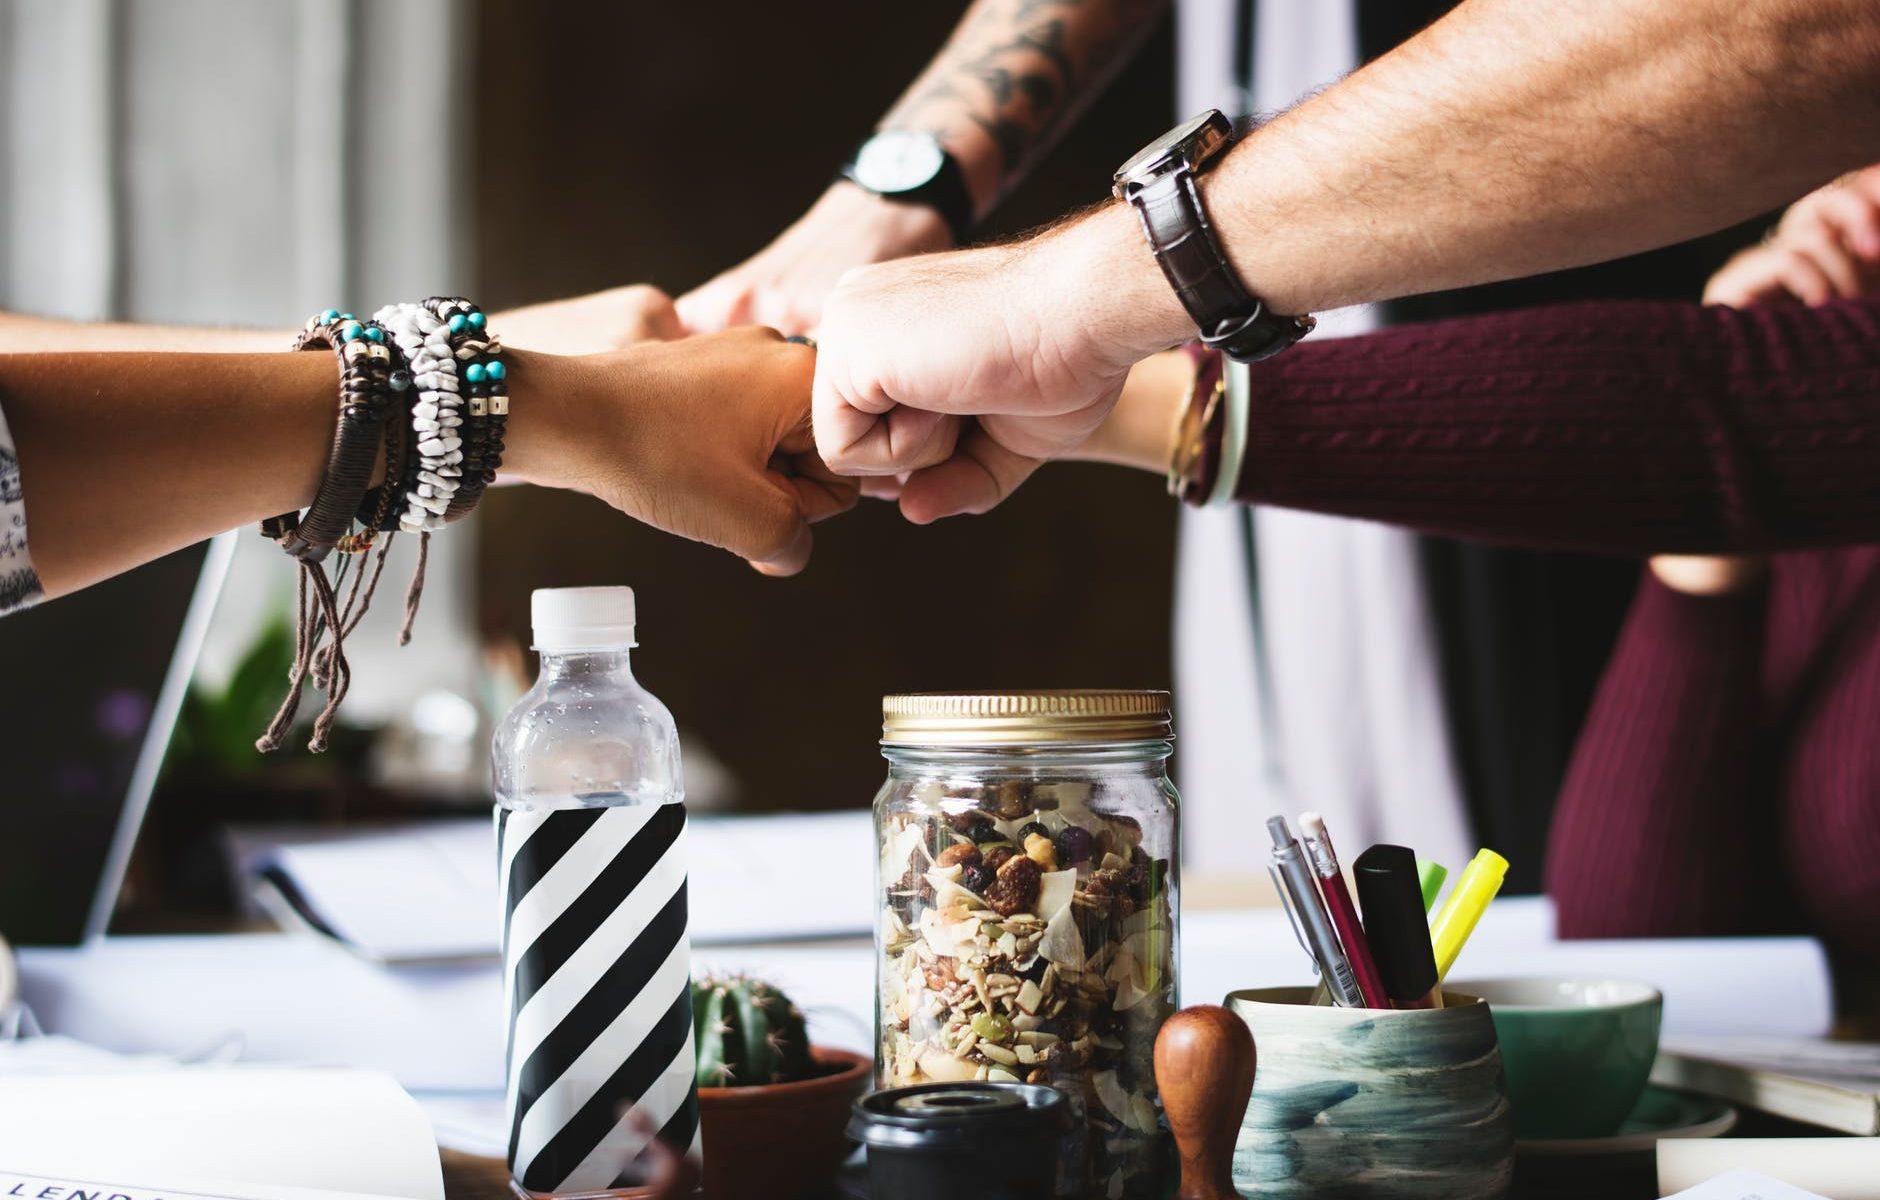 Employee Engagement: Teamwork